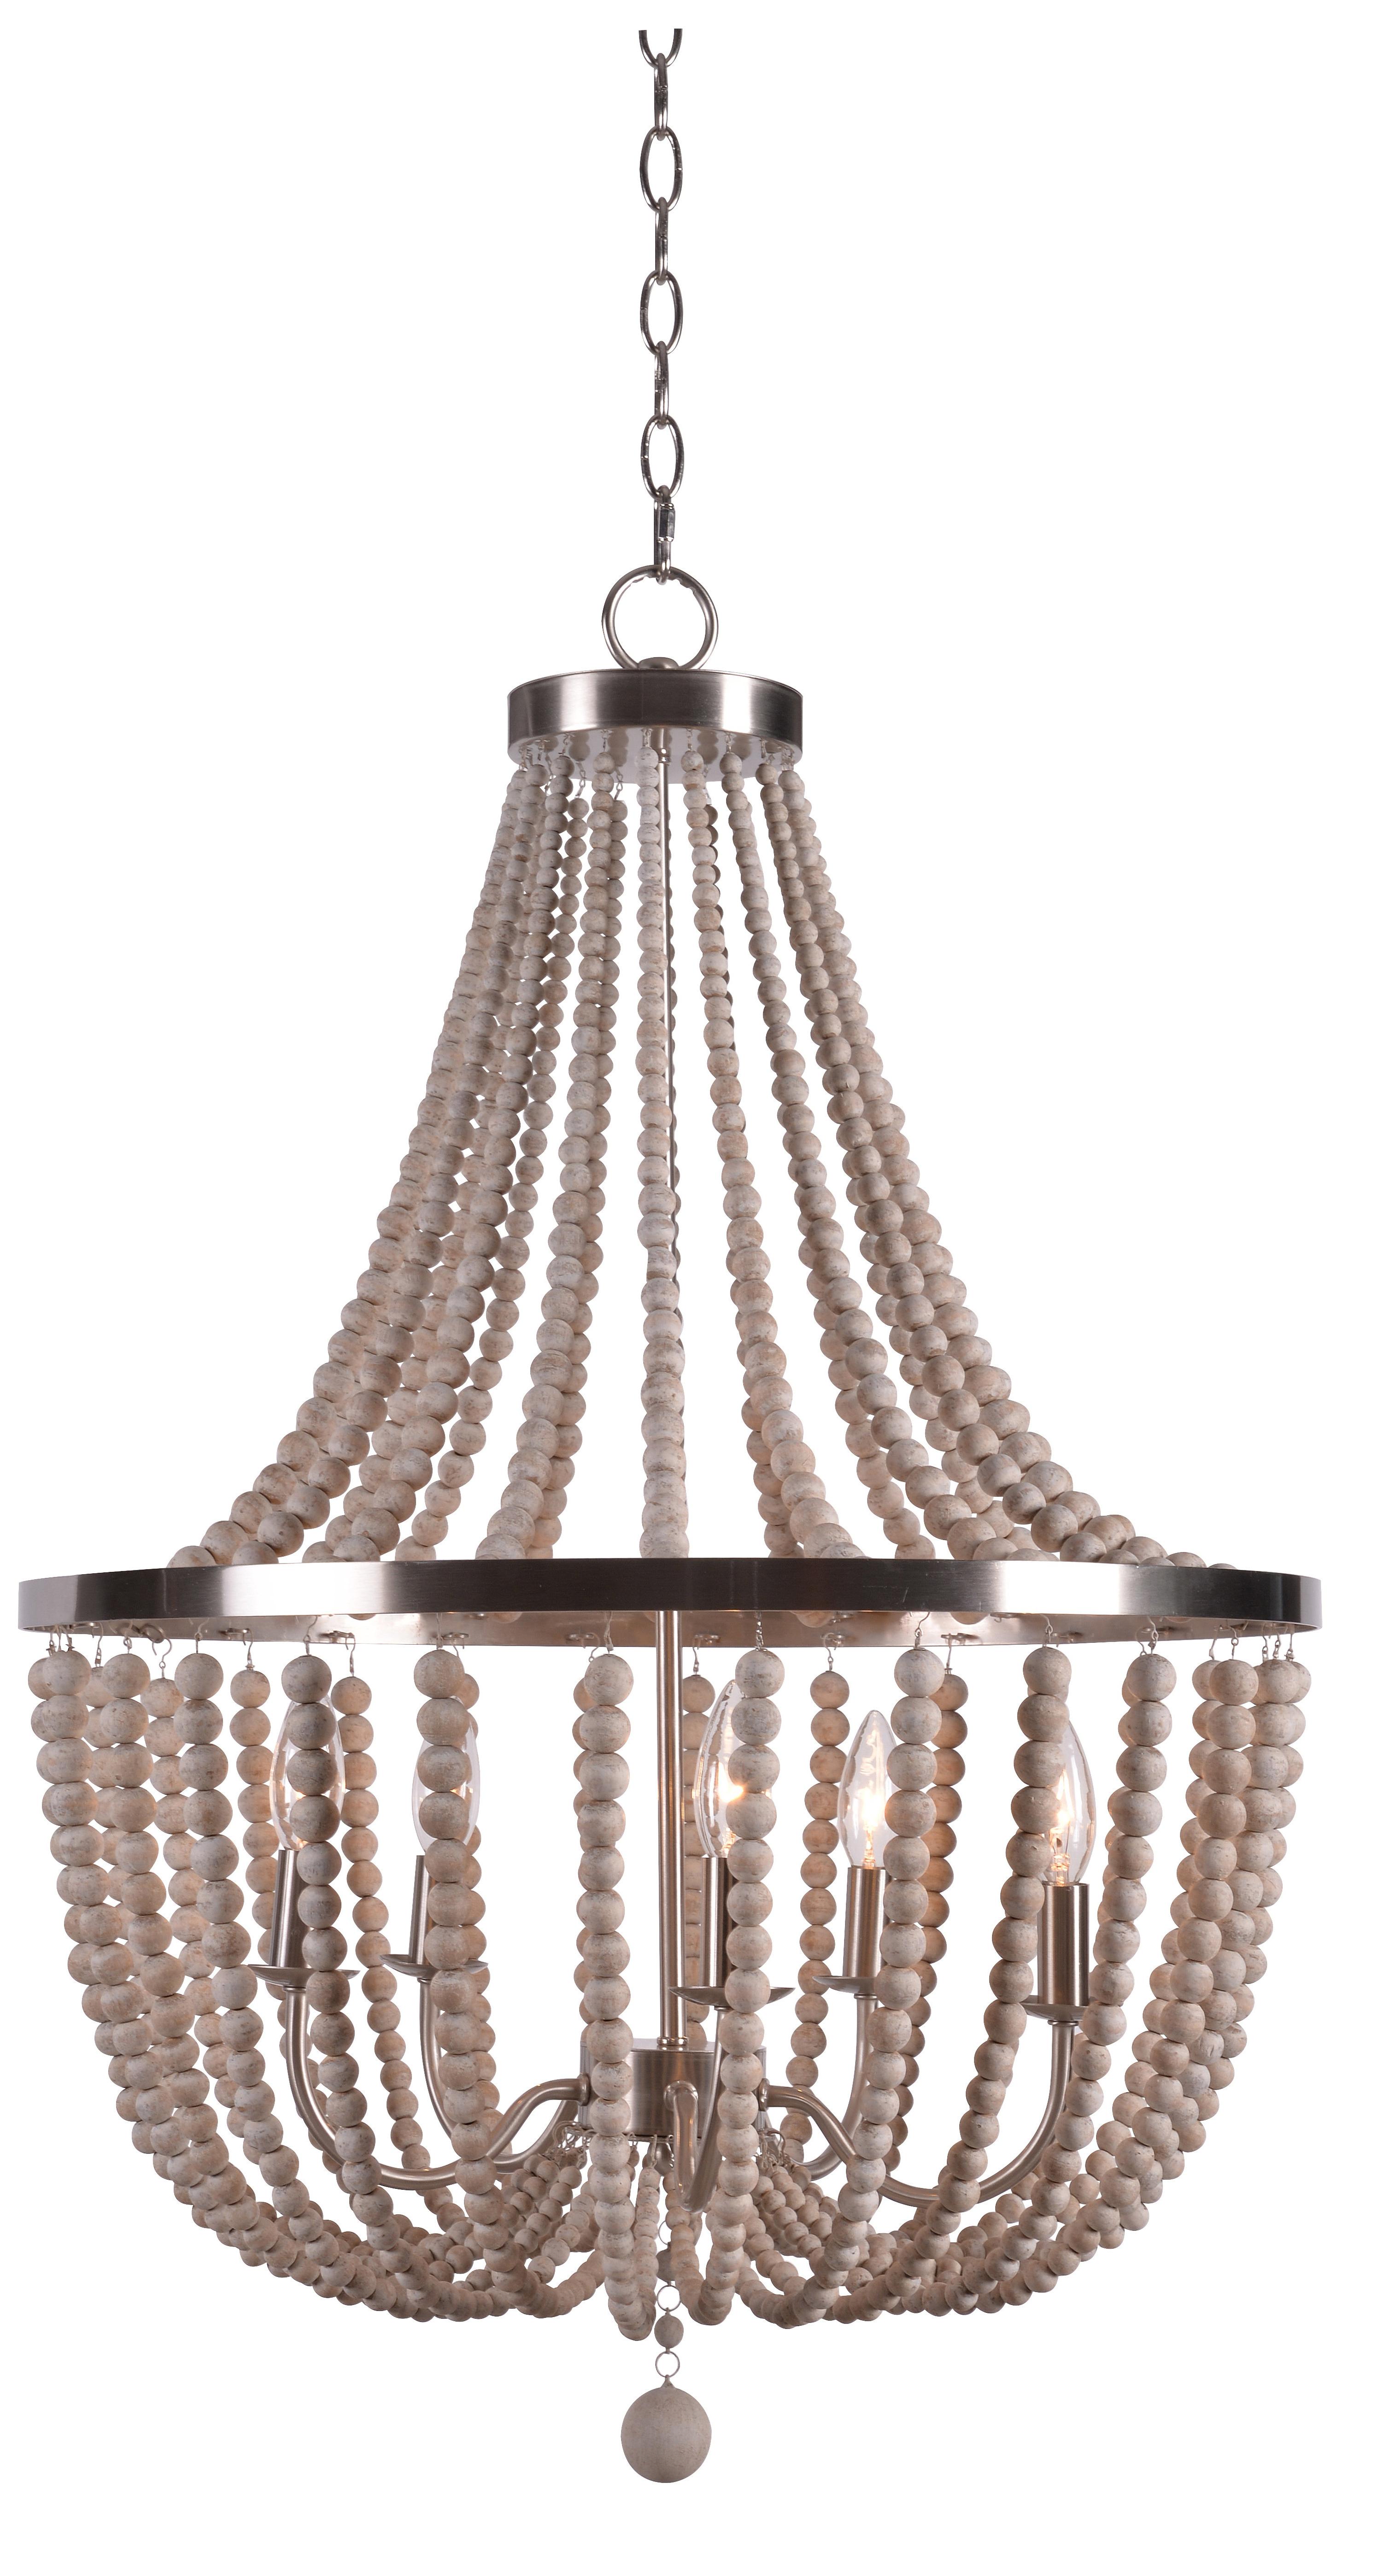 Tilden Wood Bead 5 Light Empire Chandelier With Regard To Favorite Duron 5 Light Empire Chandeliers (View 21 of 25)